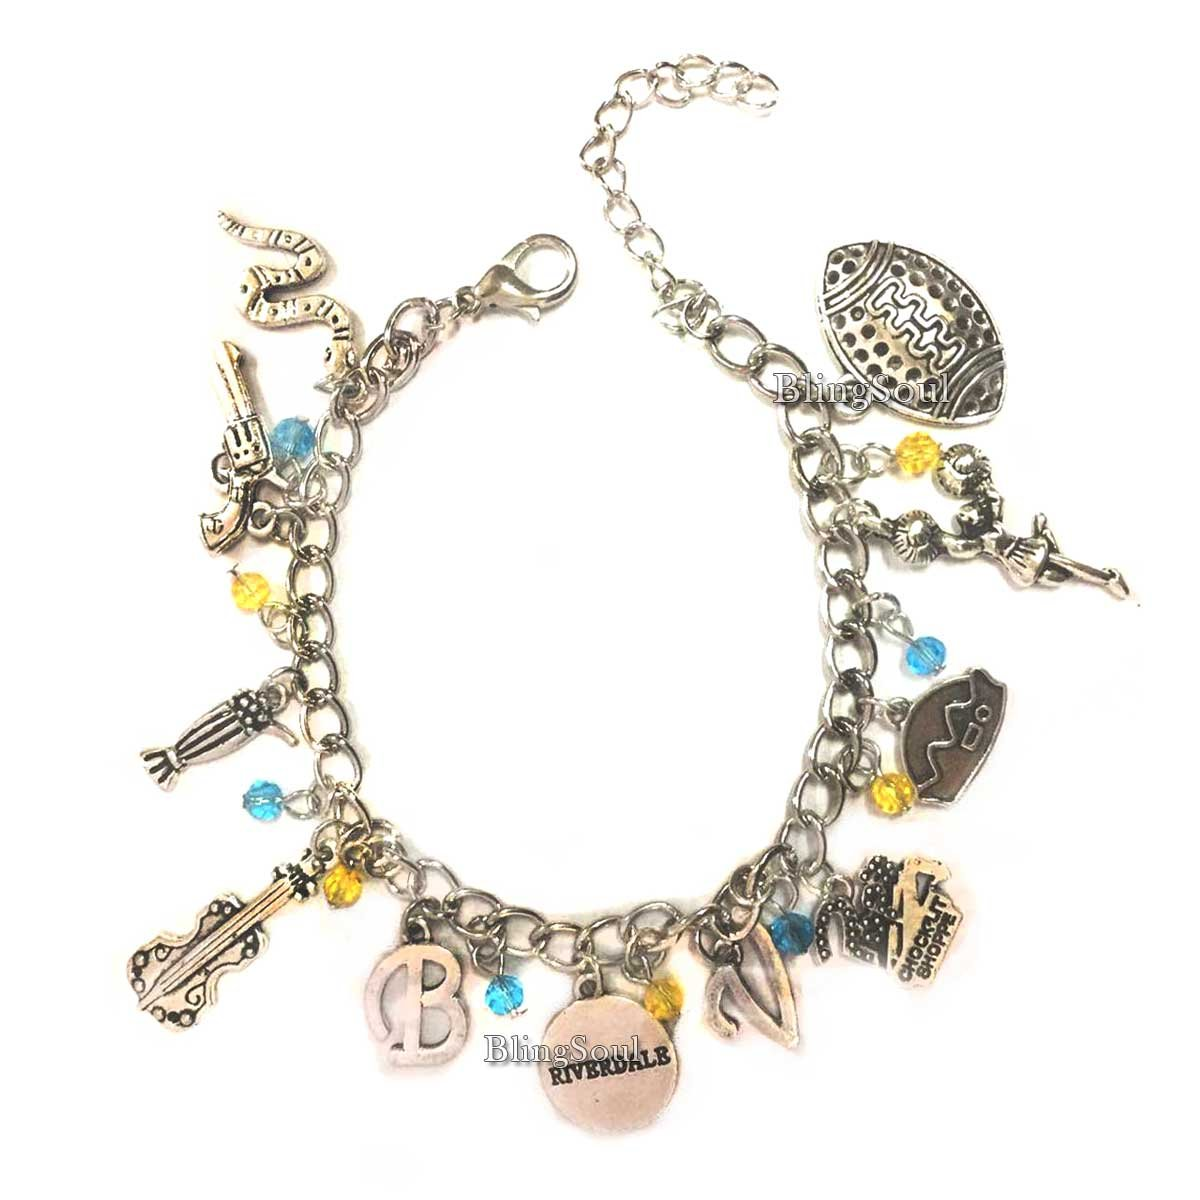 RiverdaleBracelet ArchieAndrewsMerchandise - Mothers Day Bracelets Gift - Jughead Riverdale Merchandise